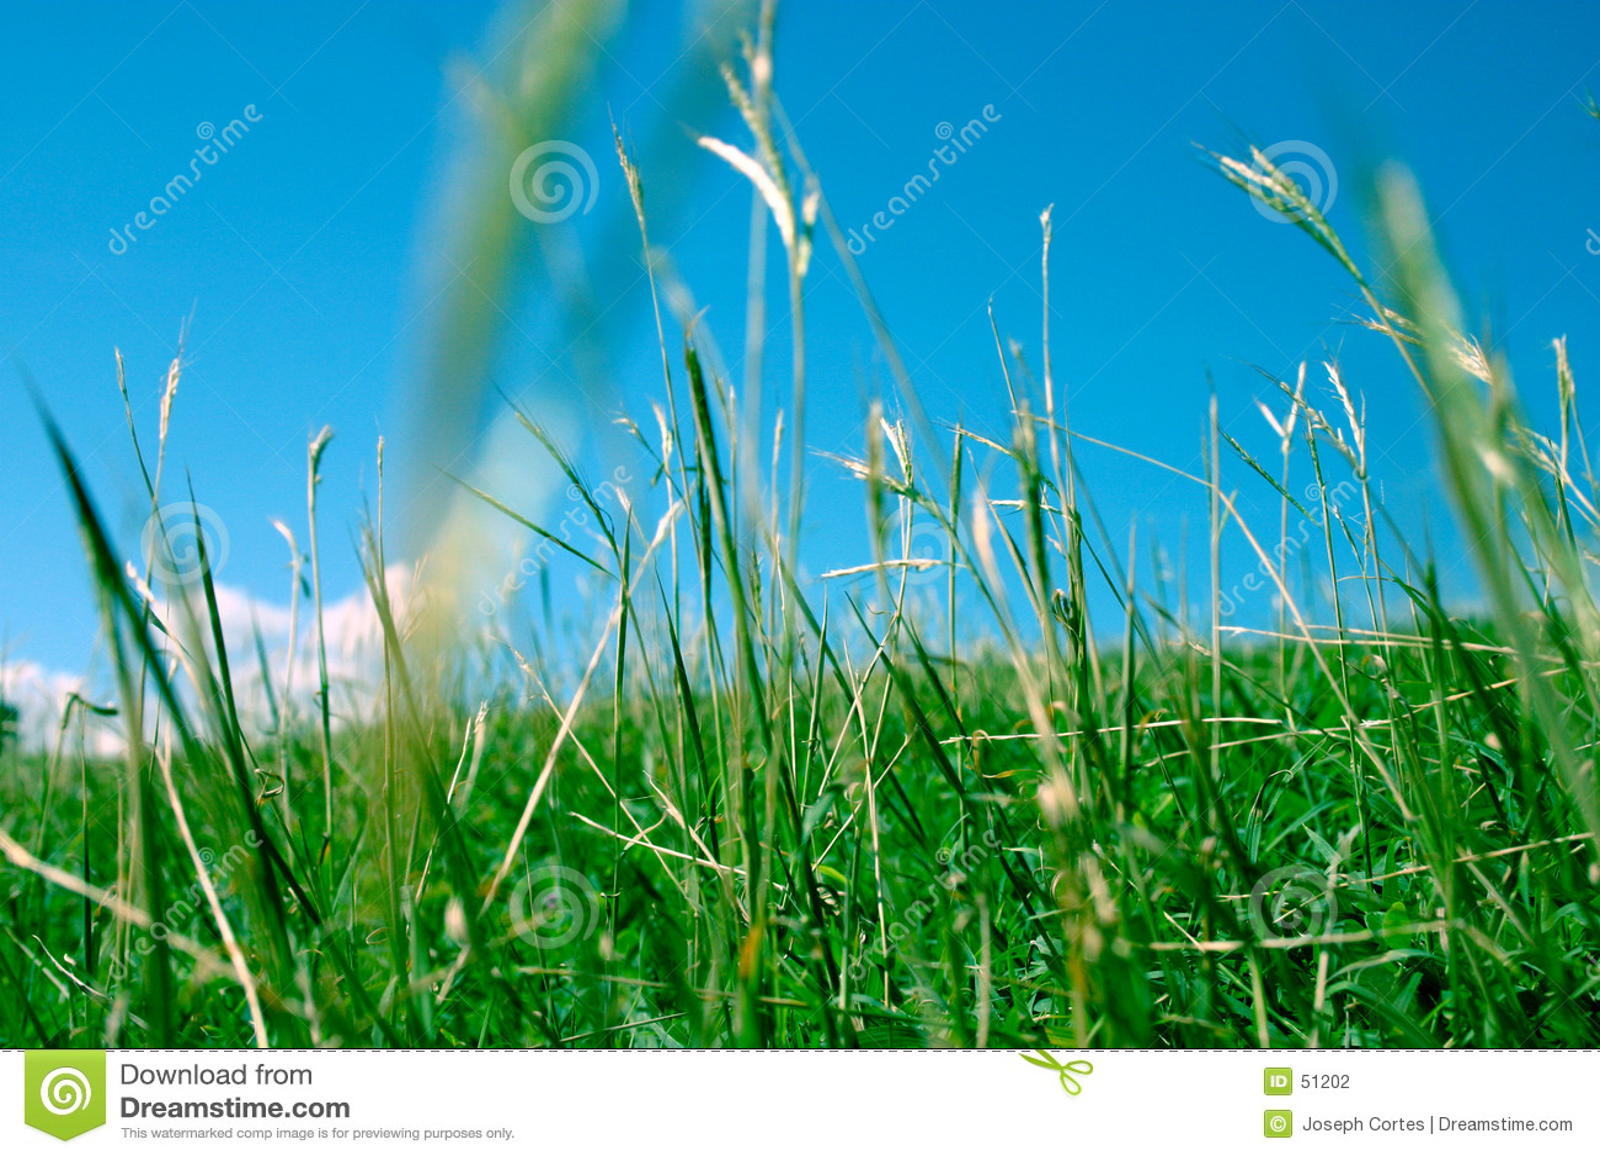 Download Herbe verte 2 photo stock. Image du anglais, côte, pays - 51202